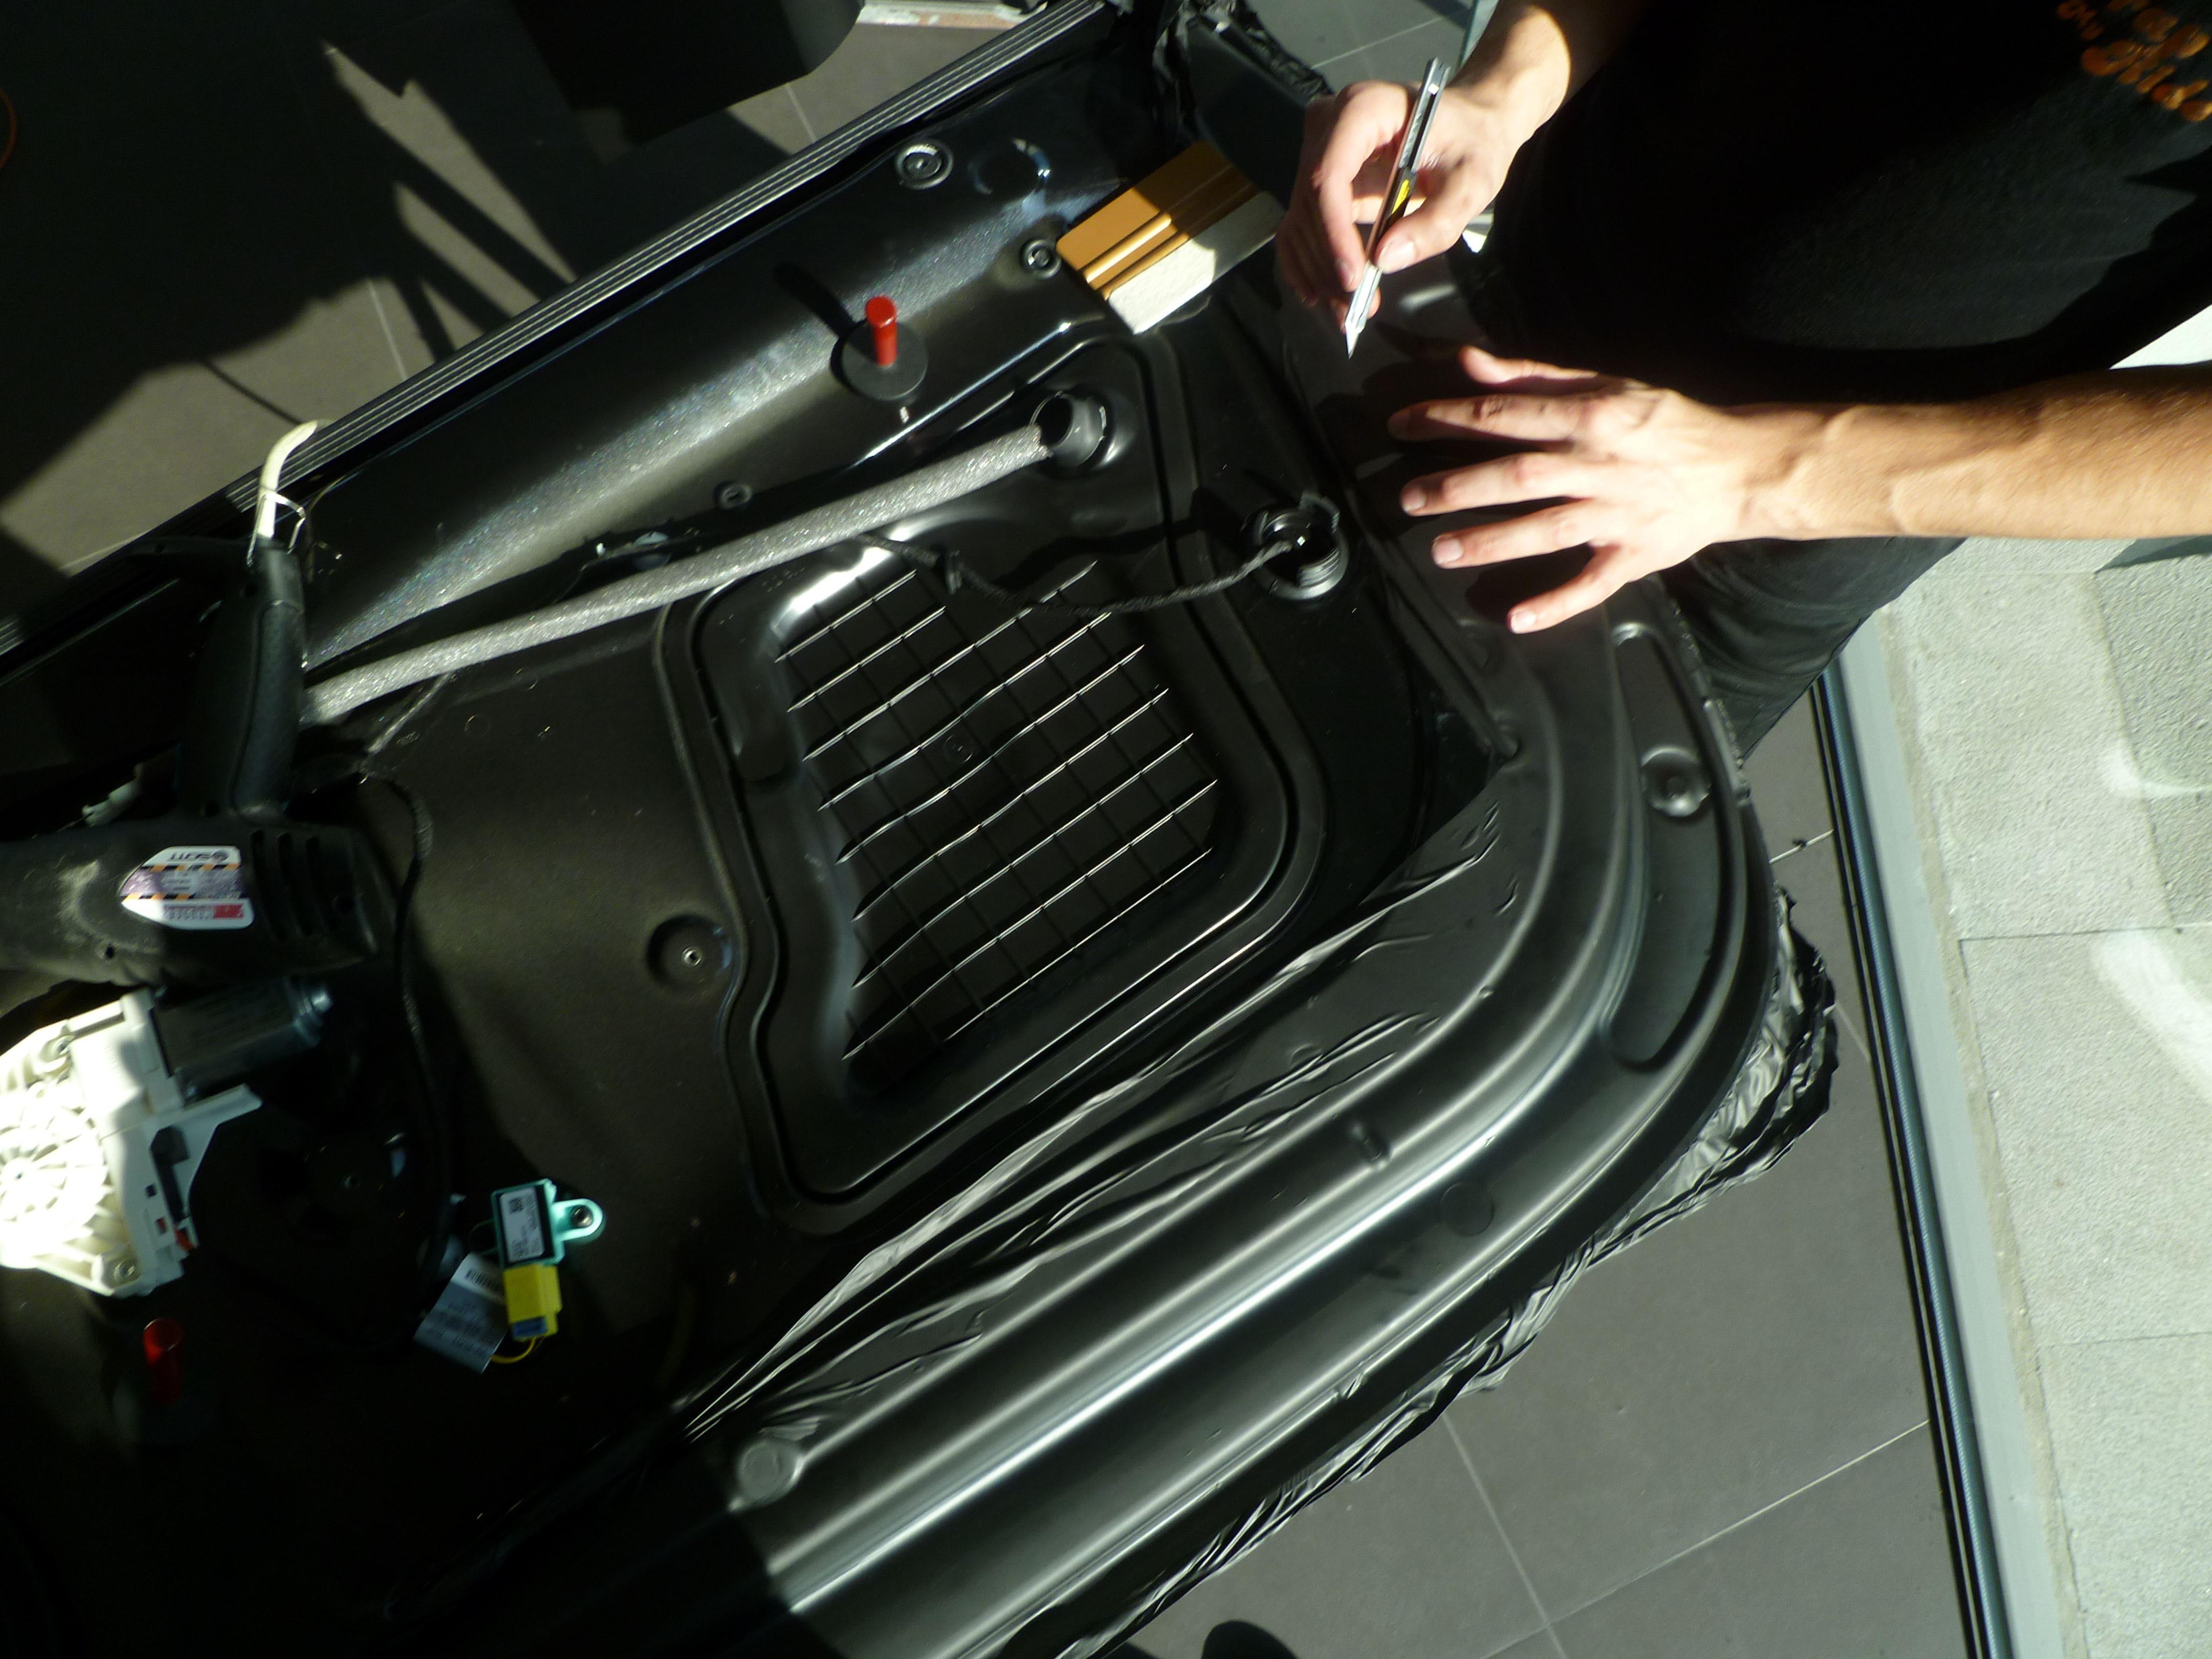 Audi A5 Coupe met Mat Zwarte Wrap, Carwrapping door Wrapmyride.nu Foto-nr:4633, ©2021